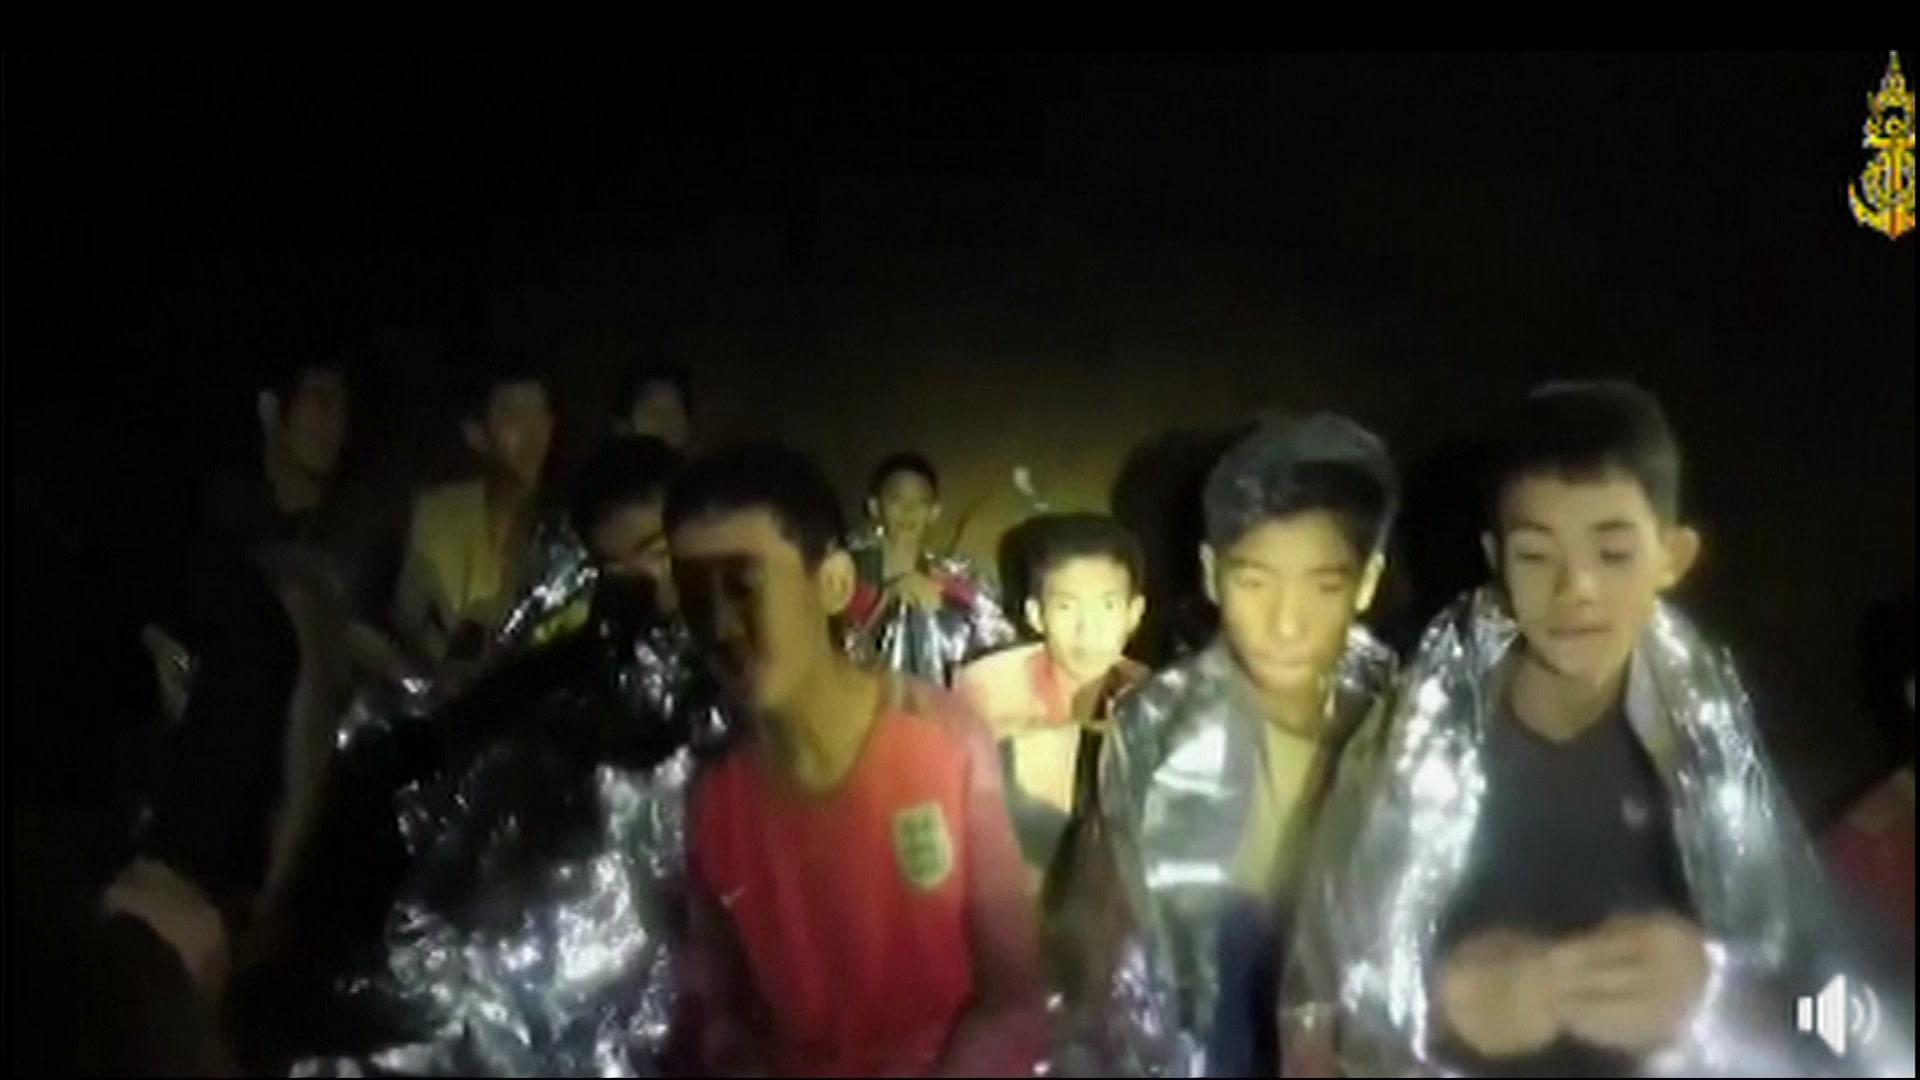 9957679_emii_thailand_cave-00.00.32.24_0.jpg